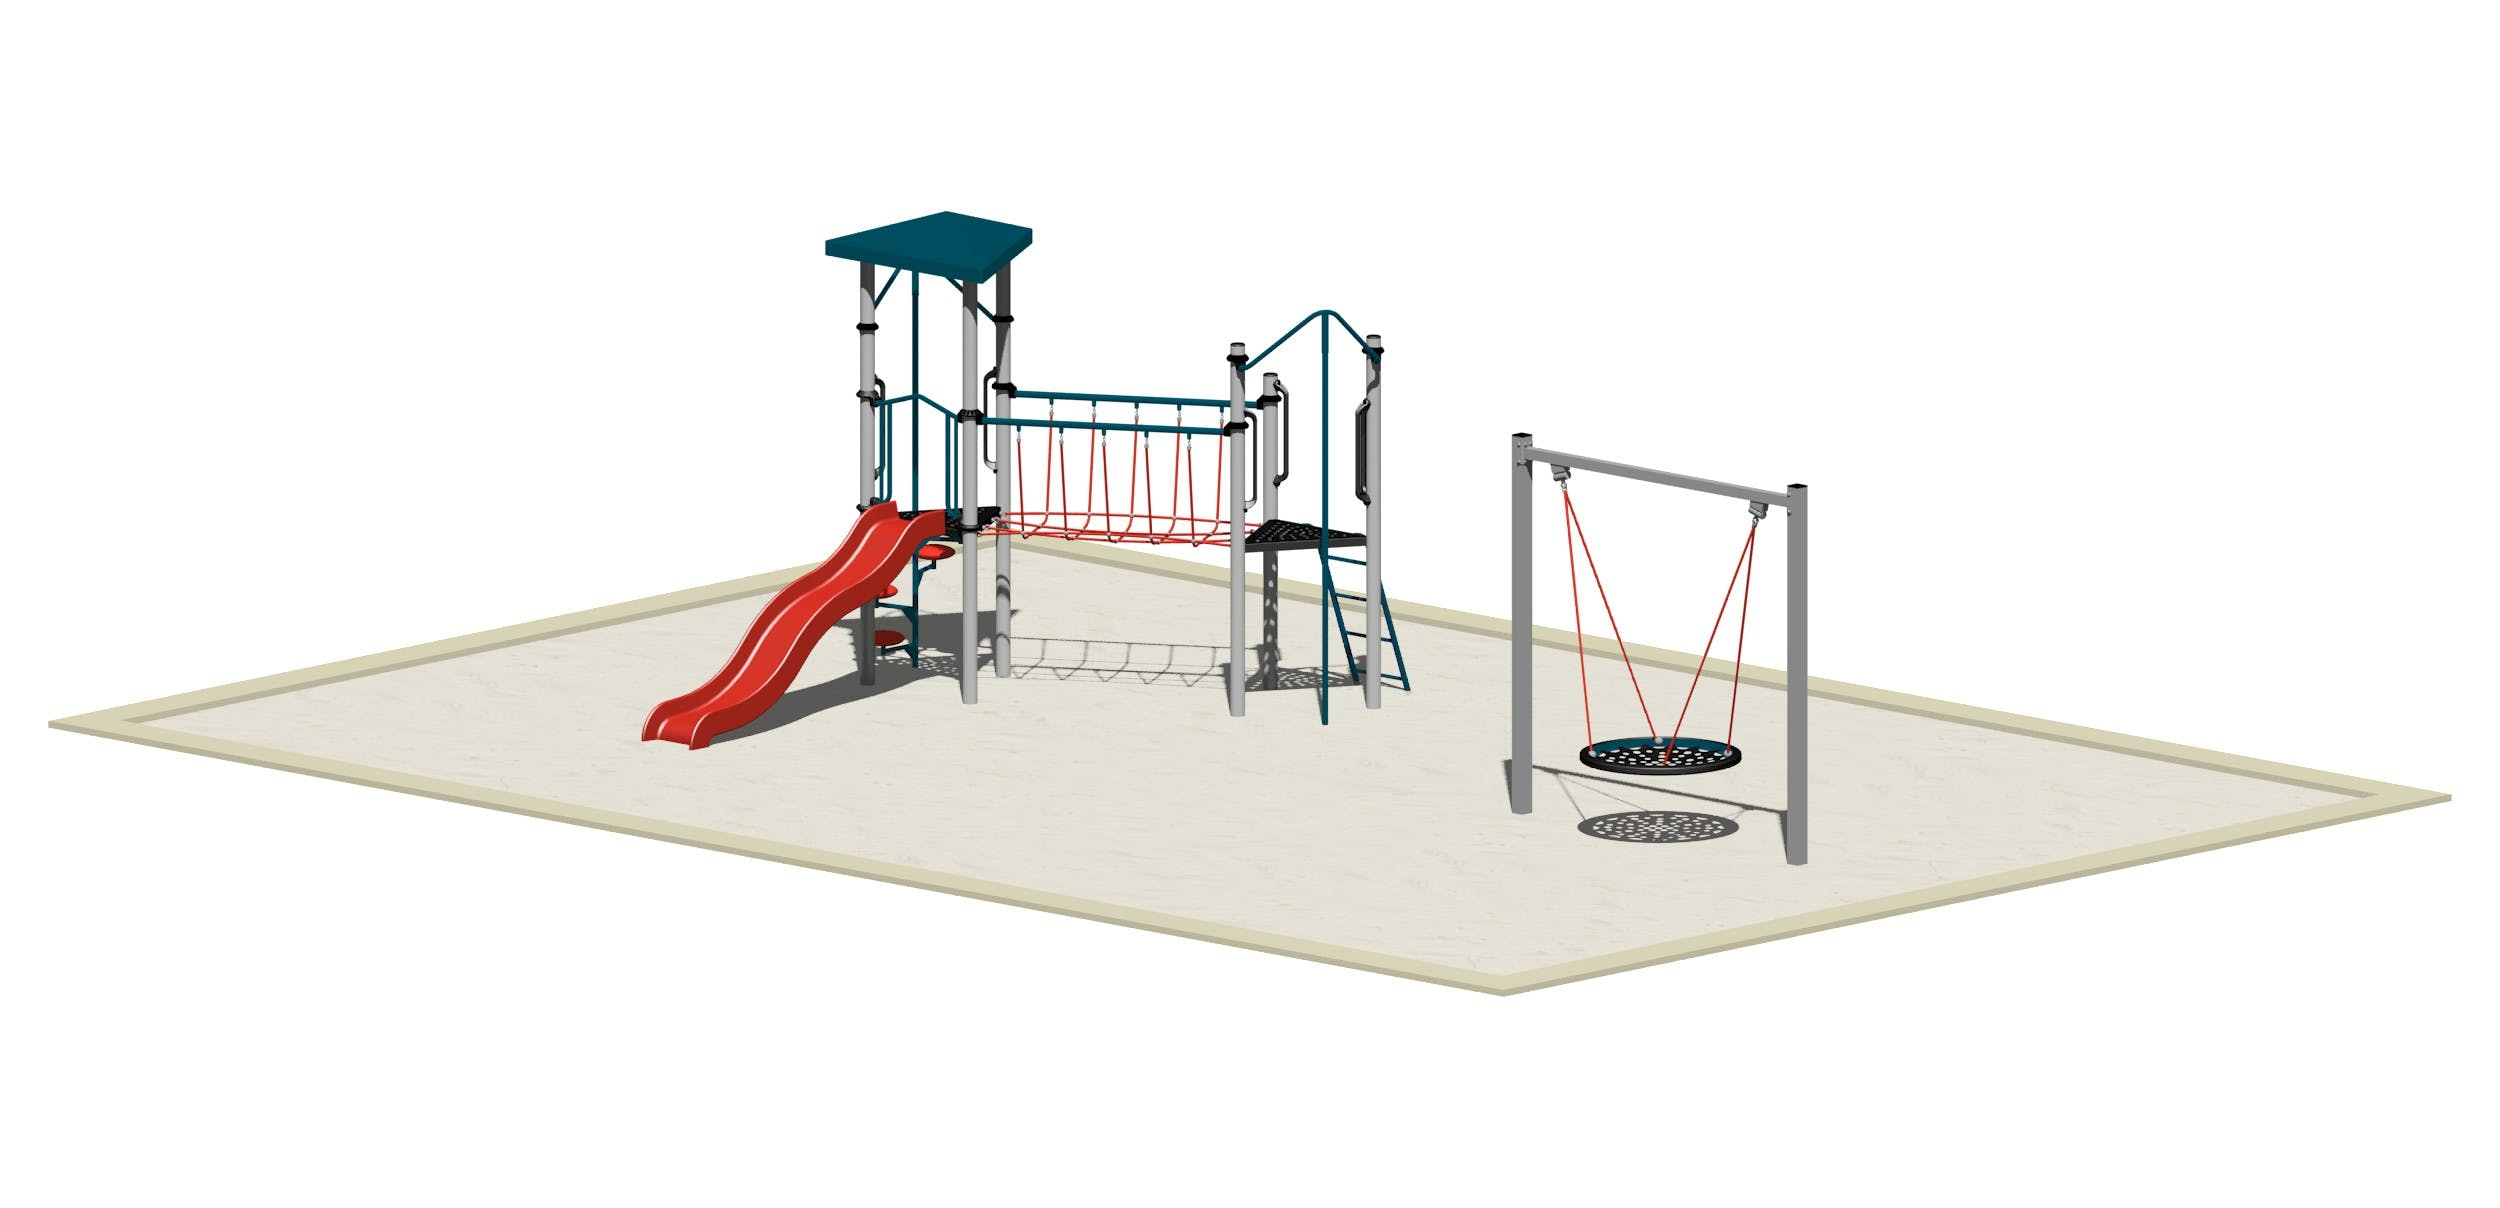 Gordon Reserve Final Concept Design